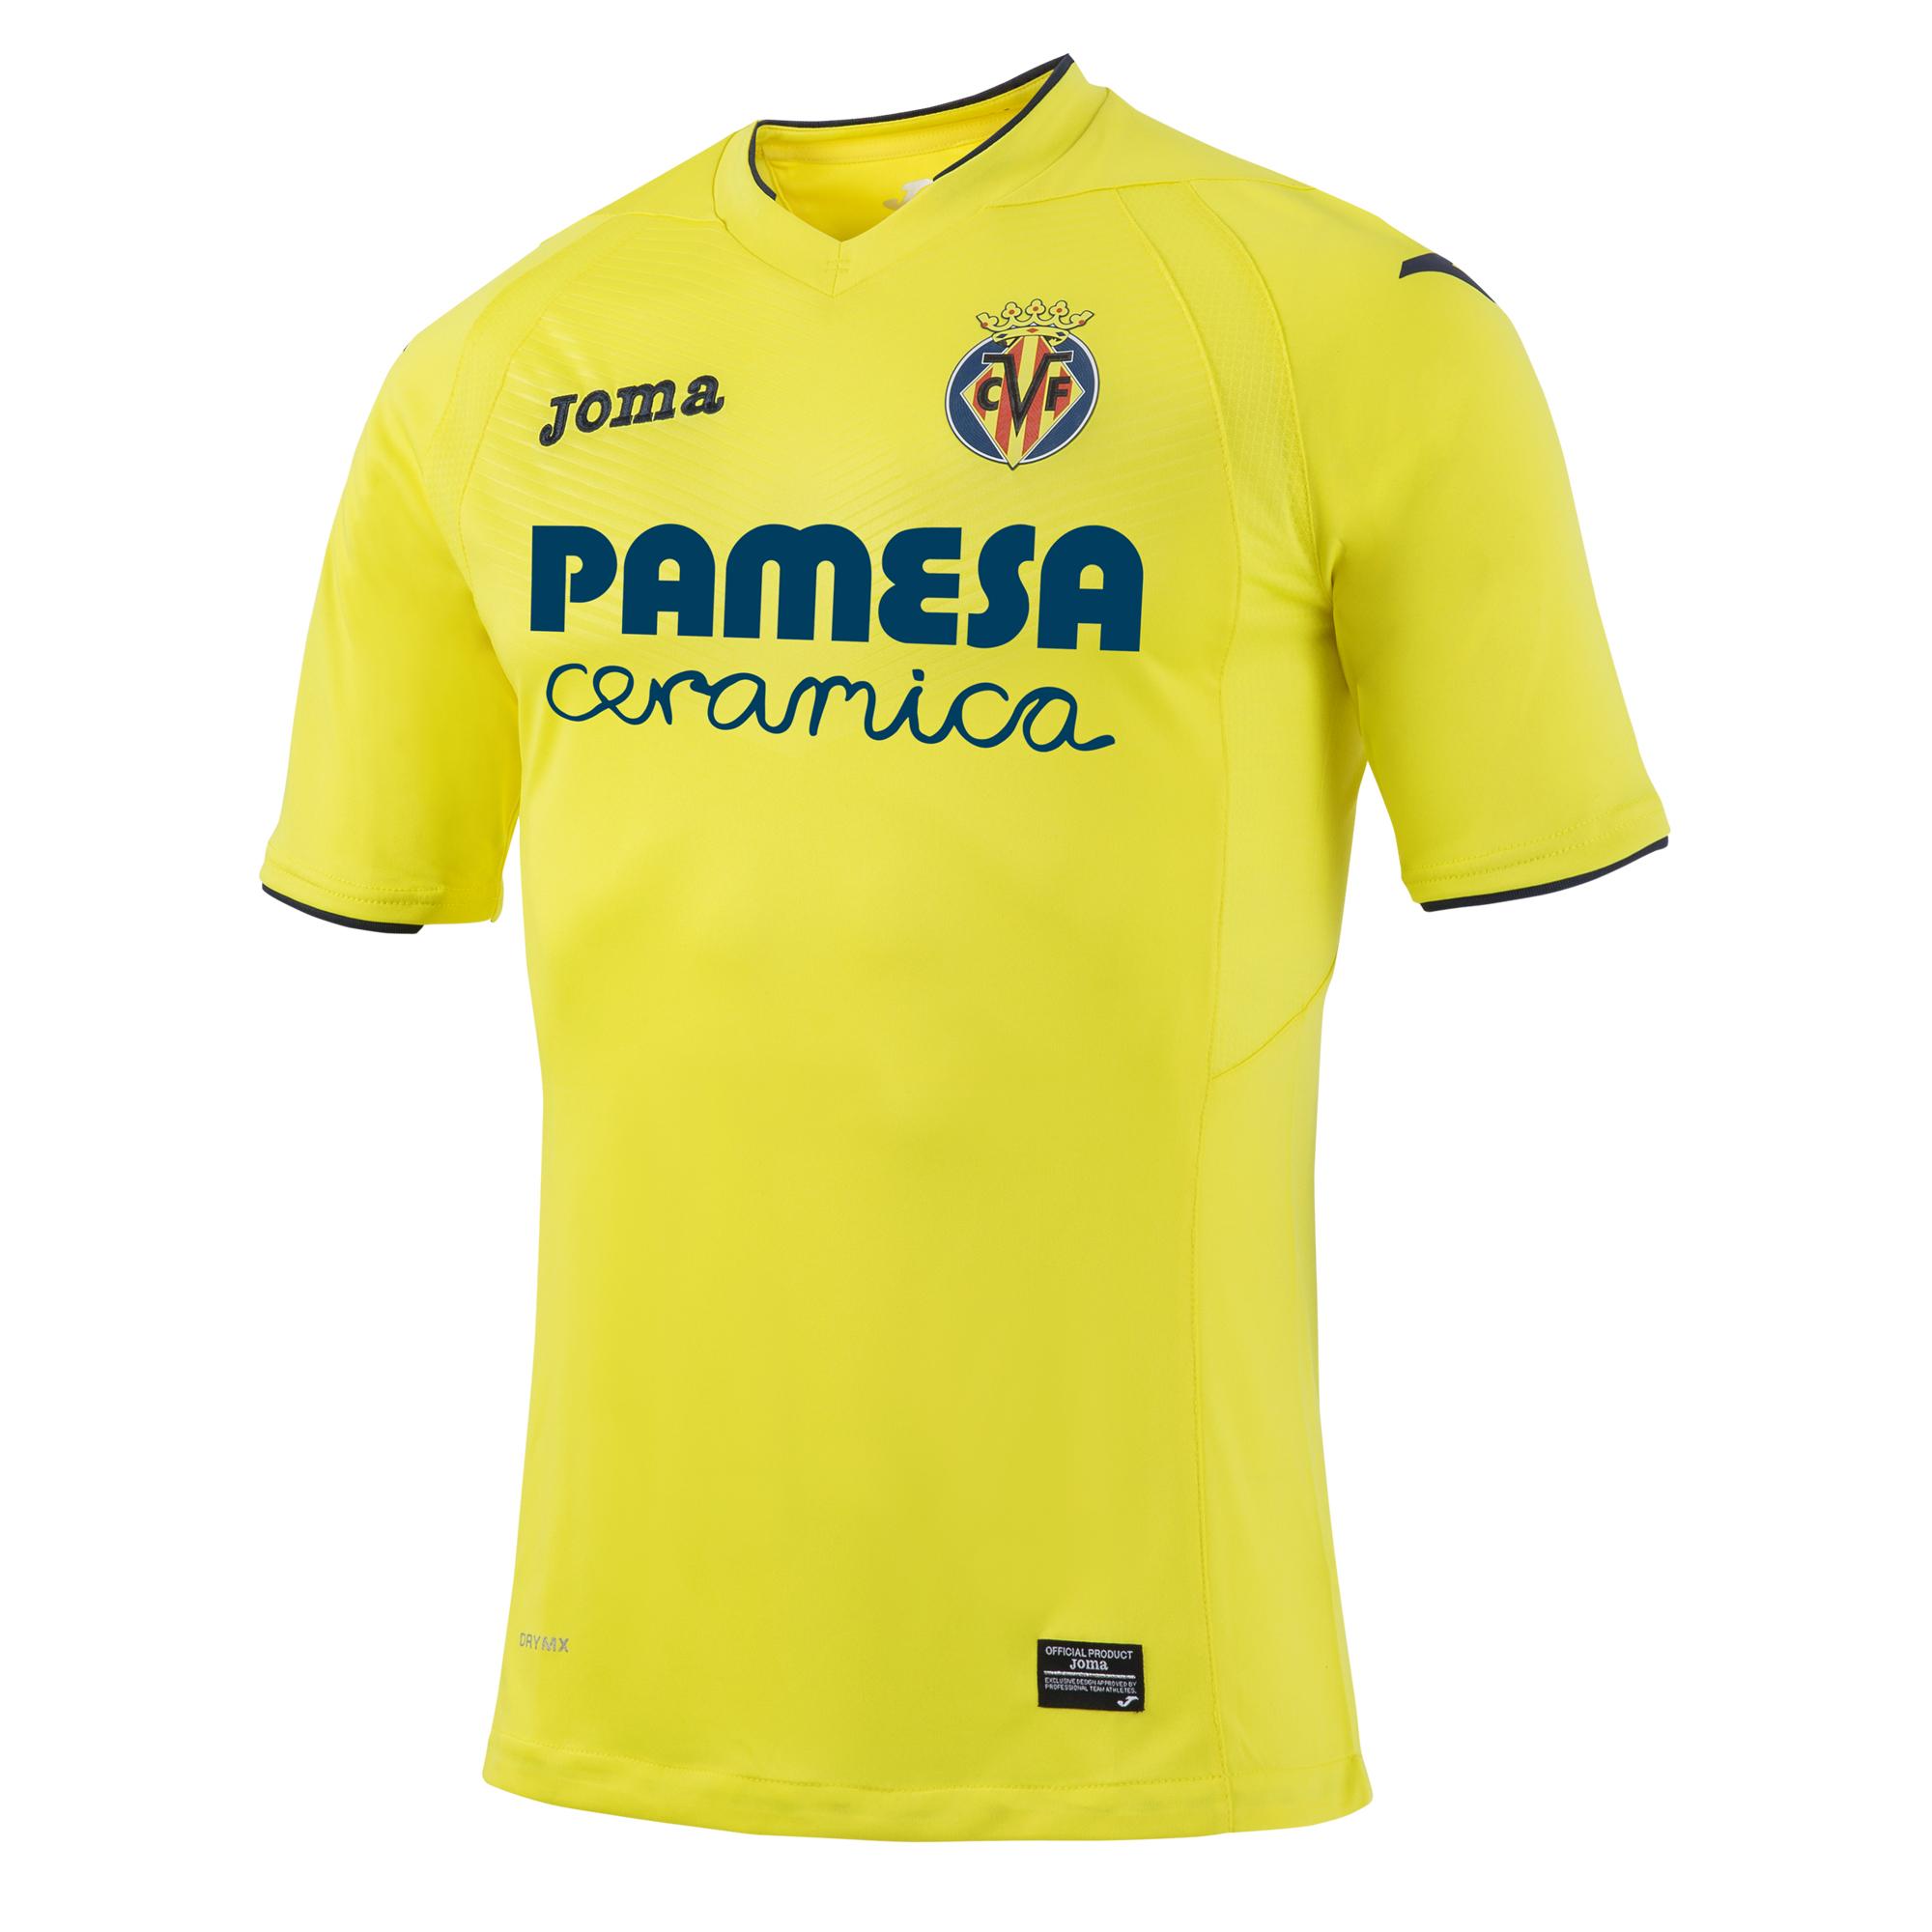 Football com category football kits image sl benfica 1st kit - 2016 2017 Villarreal Joma Home Football Shirt Vl 101011 16 Uksoccershop